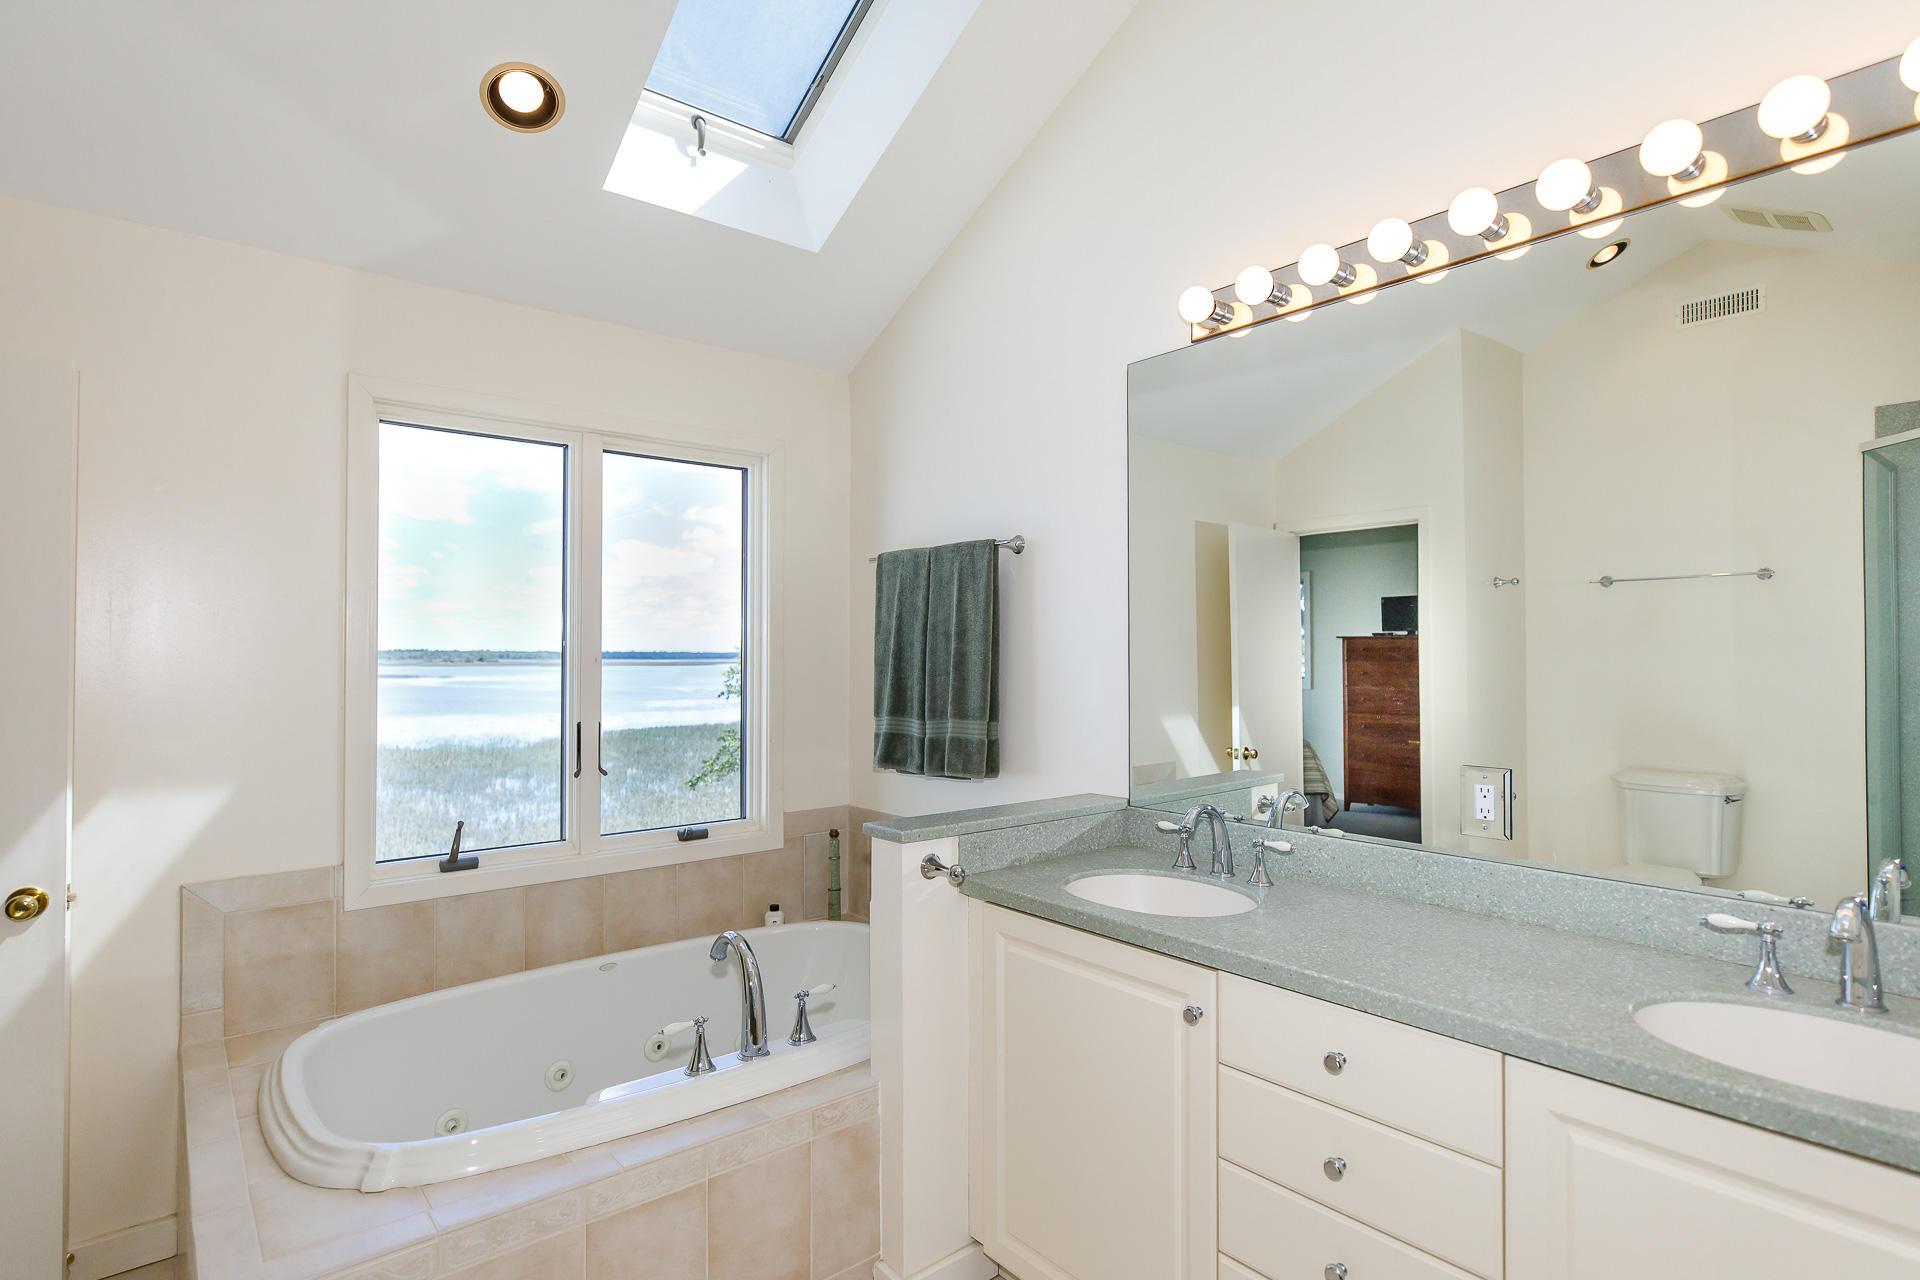 Kiawah Island Homes For Sale - 165 Marsh Hawk, Kiawah Island, SC - 21